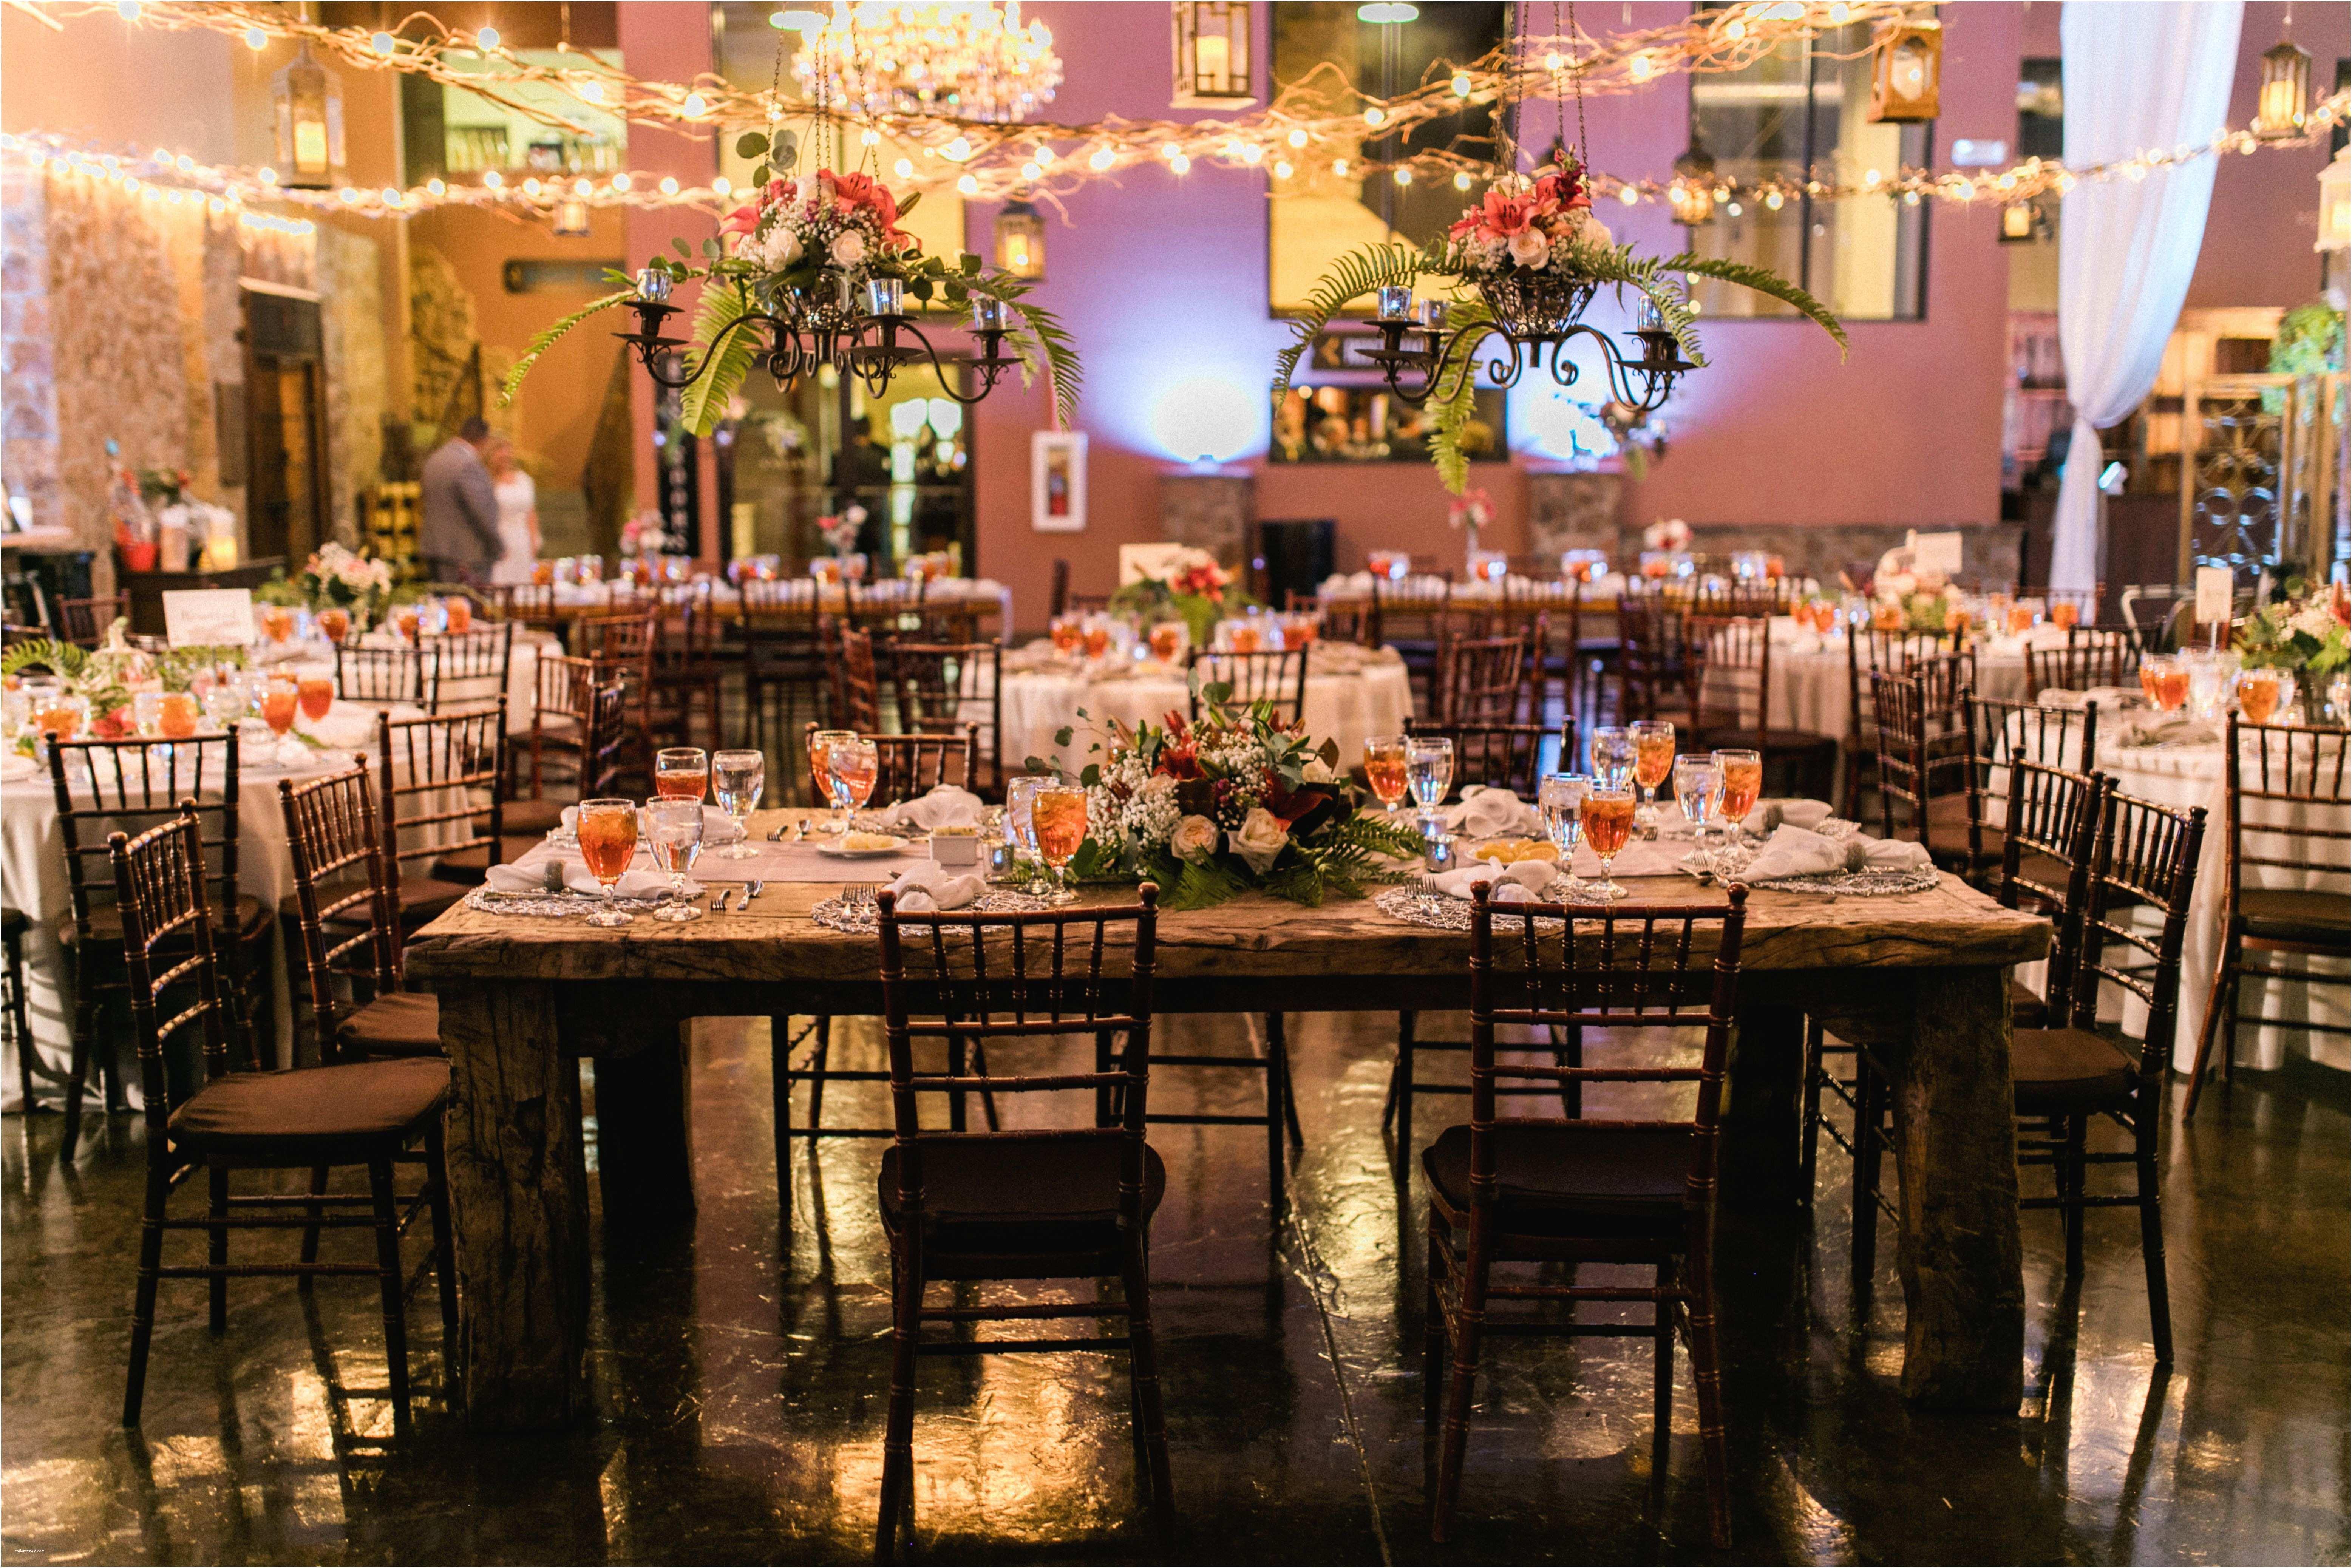 Wedding Invitations El Paso Tx 150 Sunset event Center El Paso Tx